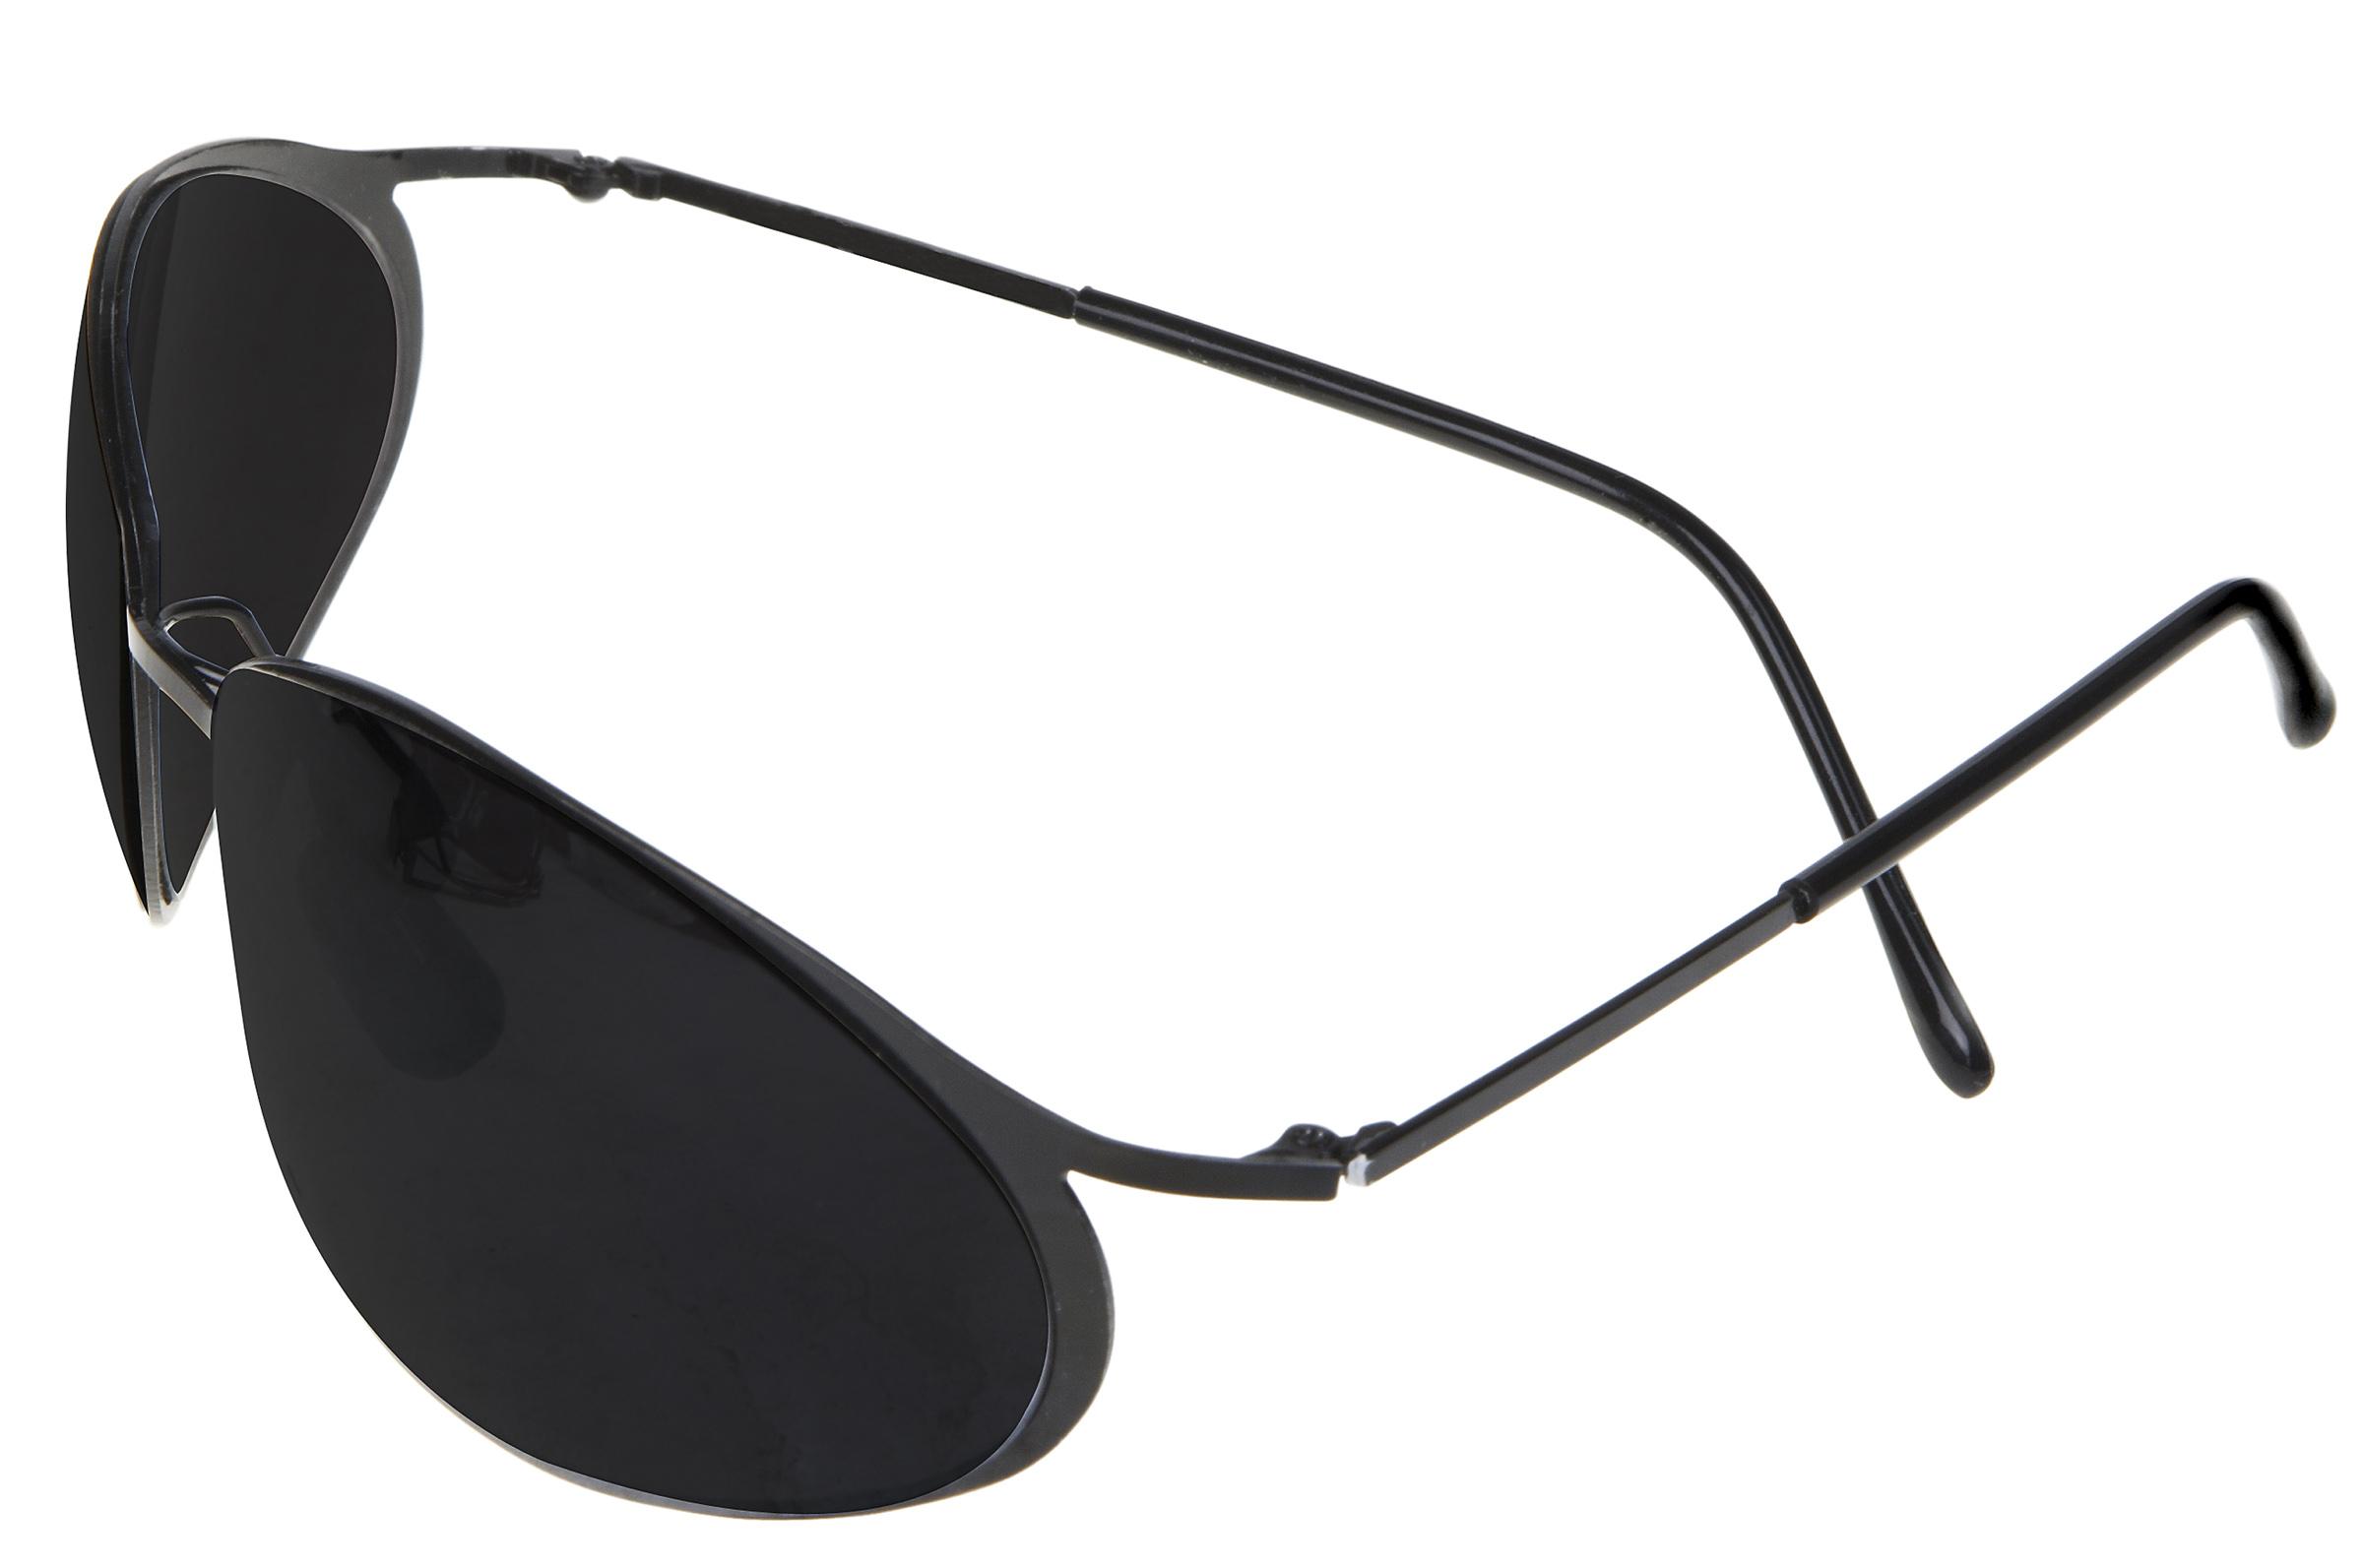 4e09a17cd5cf How to Repair Ray-Ban Sunglasses